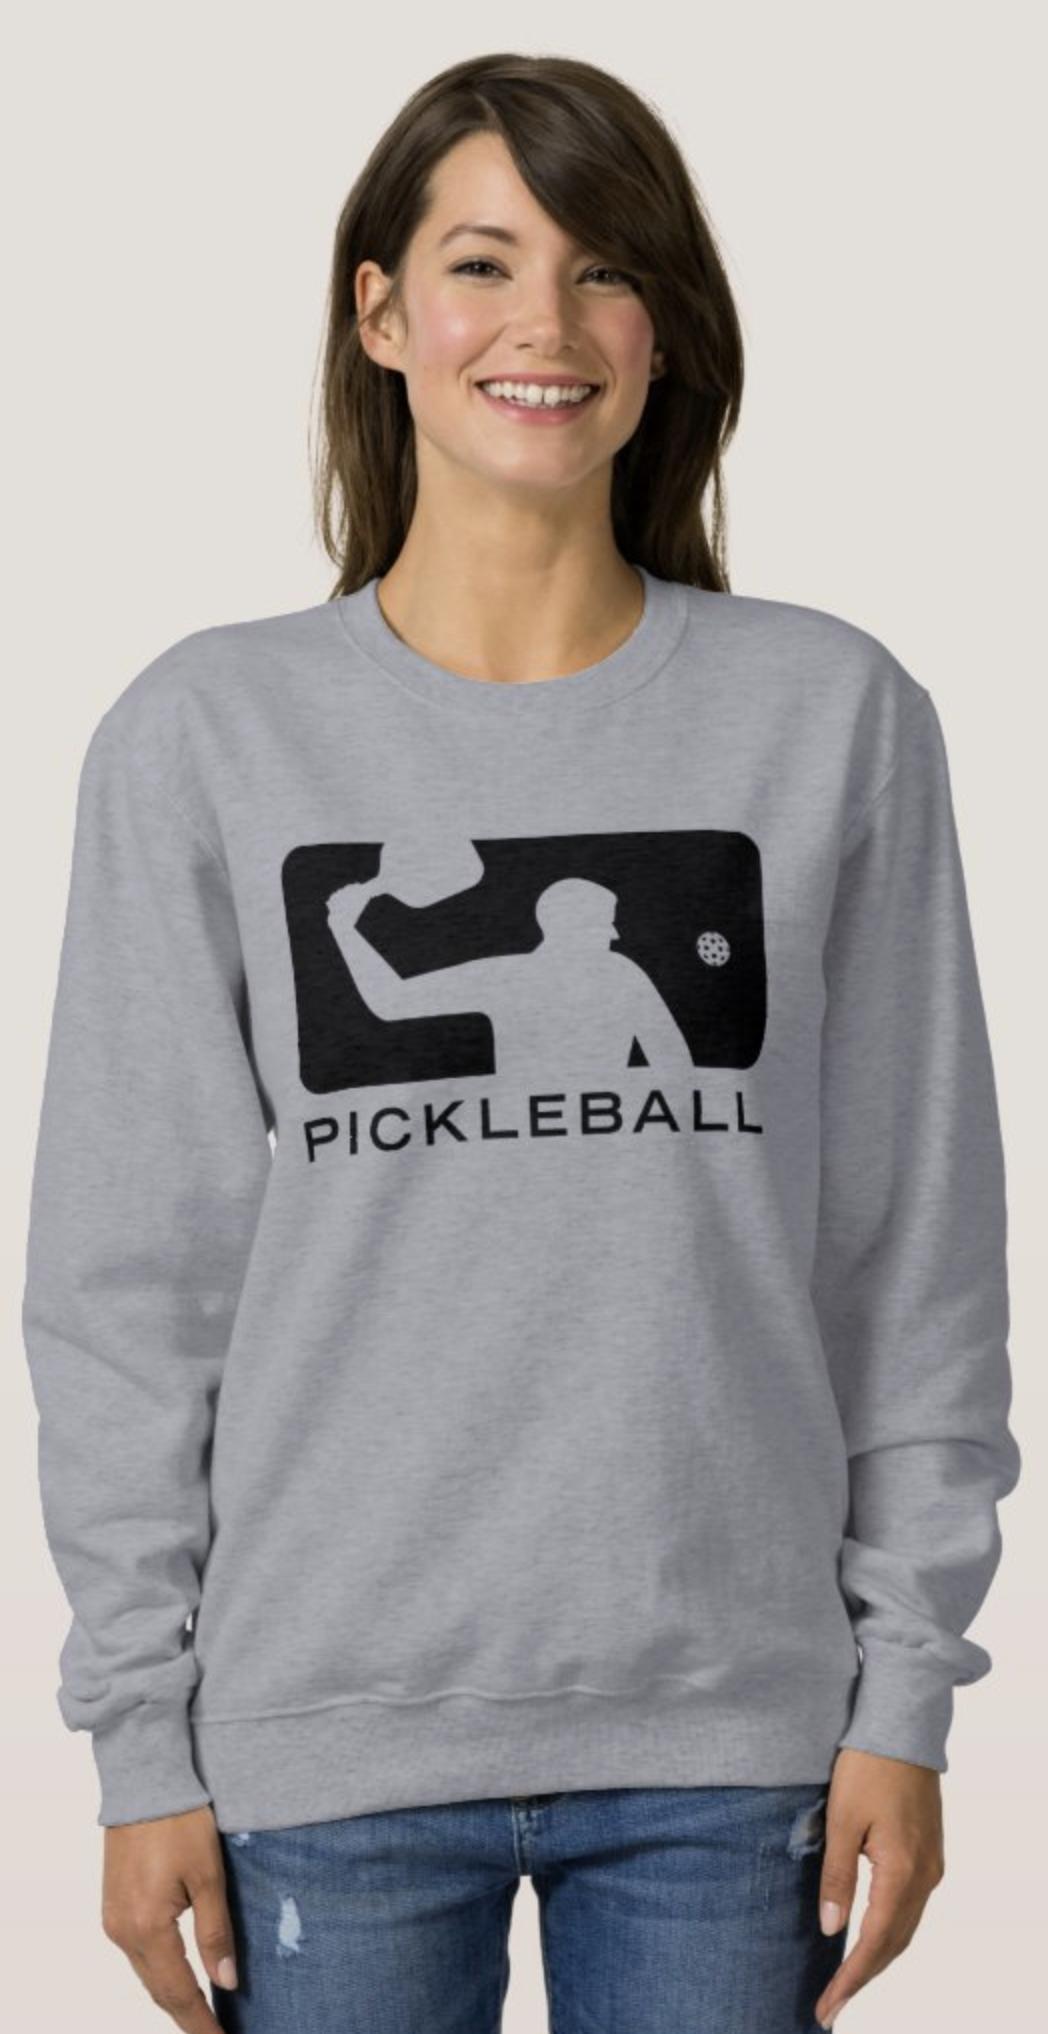 27.99 · PICKLEBALL SWEATSHIRT MAJOR LEAGUE PICKLEBALL